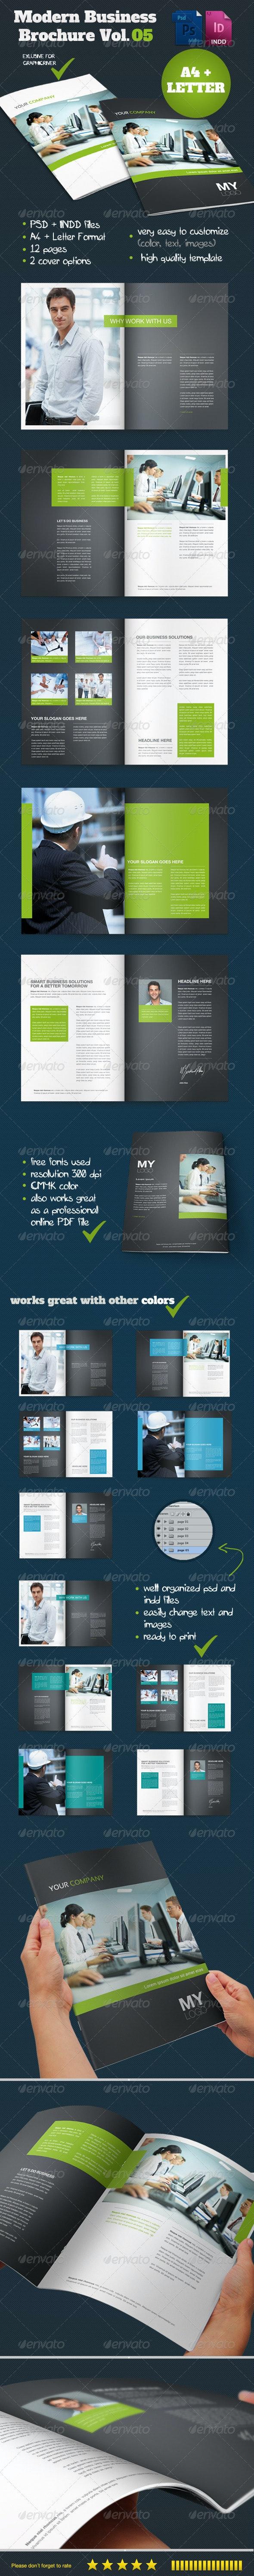 Modern Business Brochure Vol. 05 - Corporate Brochures